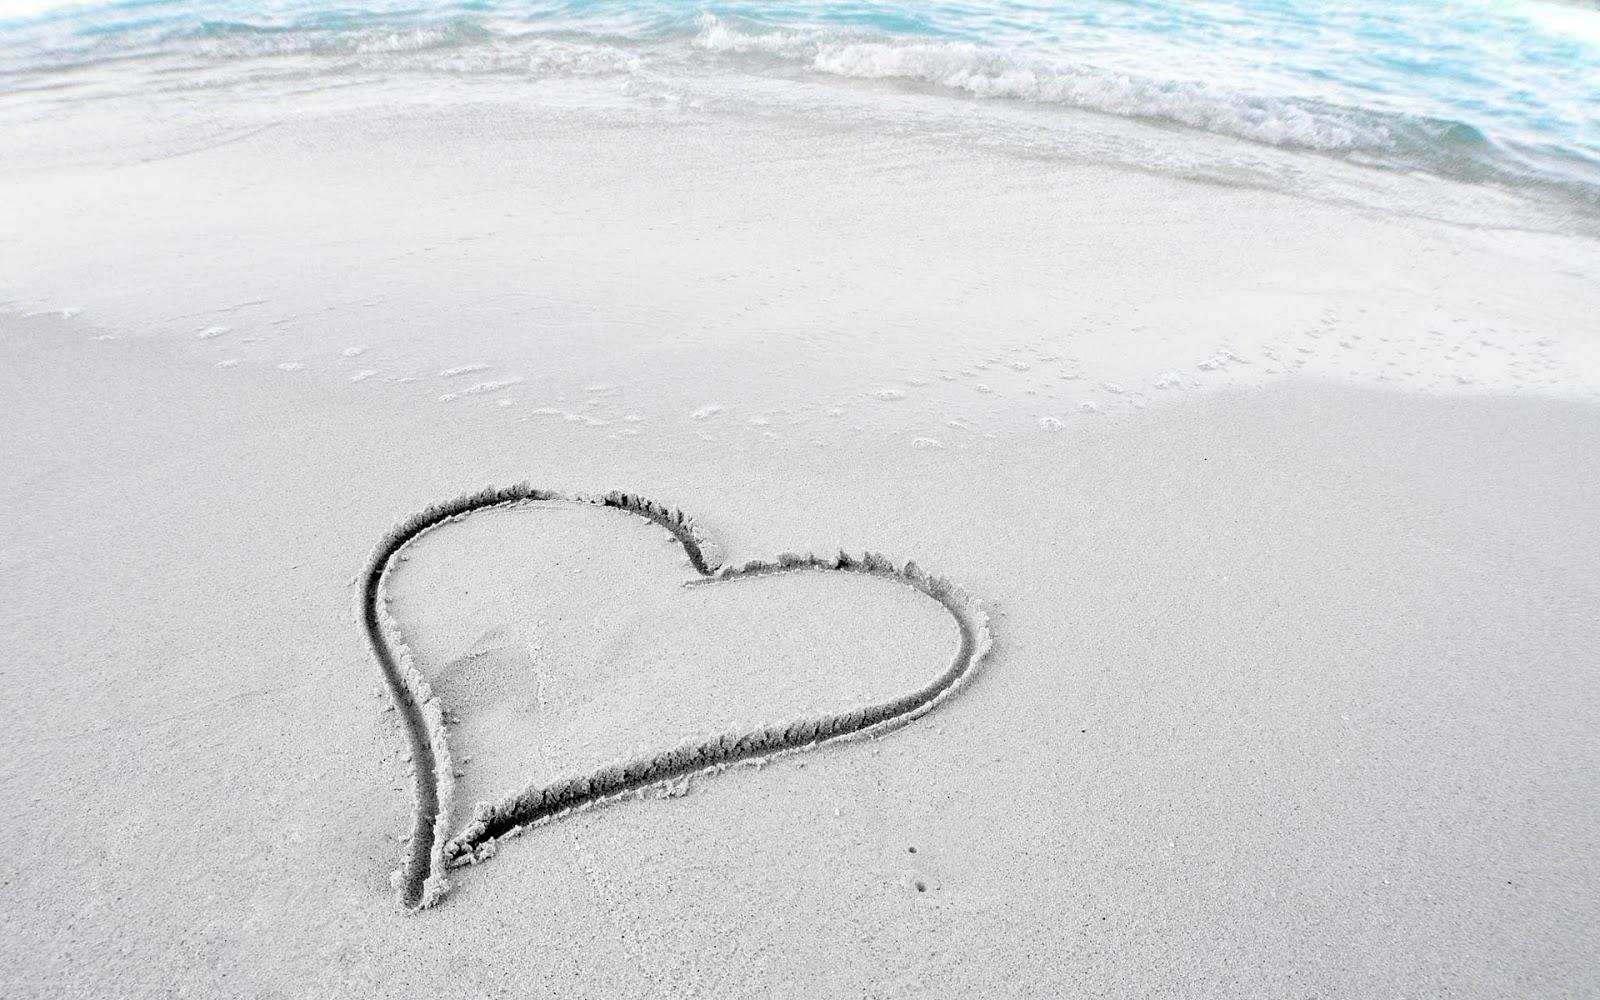 http://2.bp.blogspot.com/-eCtkXuvVFOY/UHqjhvEfMeI/AAAAAAAABCU/xyonmgImKOU/s1600/Lonely+Heart+Sand+HD+Wallpaper+-+LoveWallpapers4u.Blogspot.Com.jpg